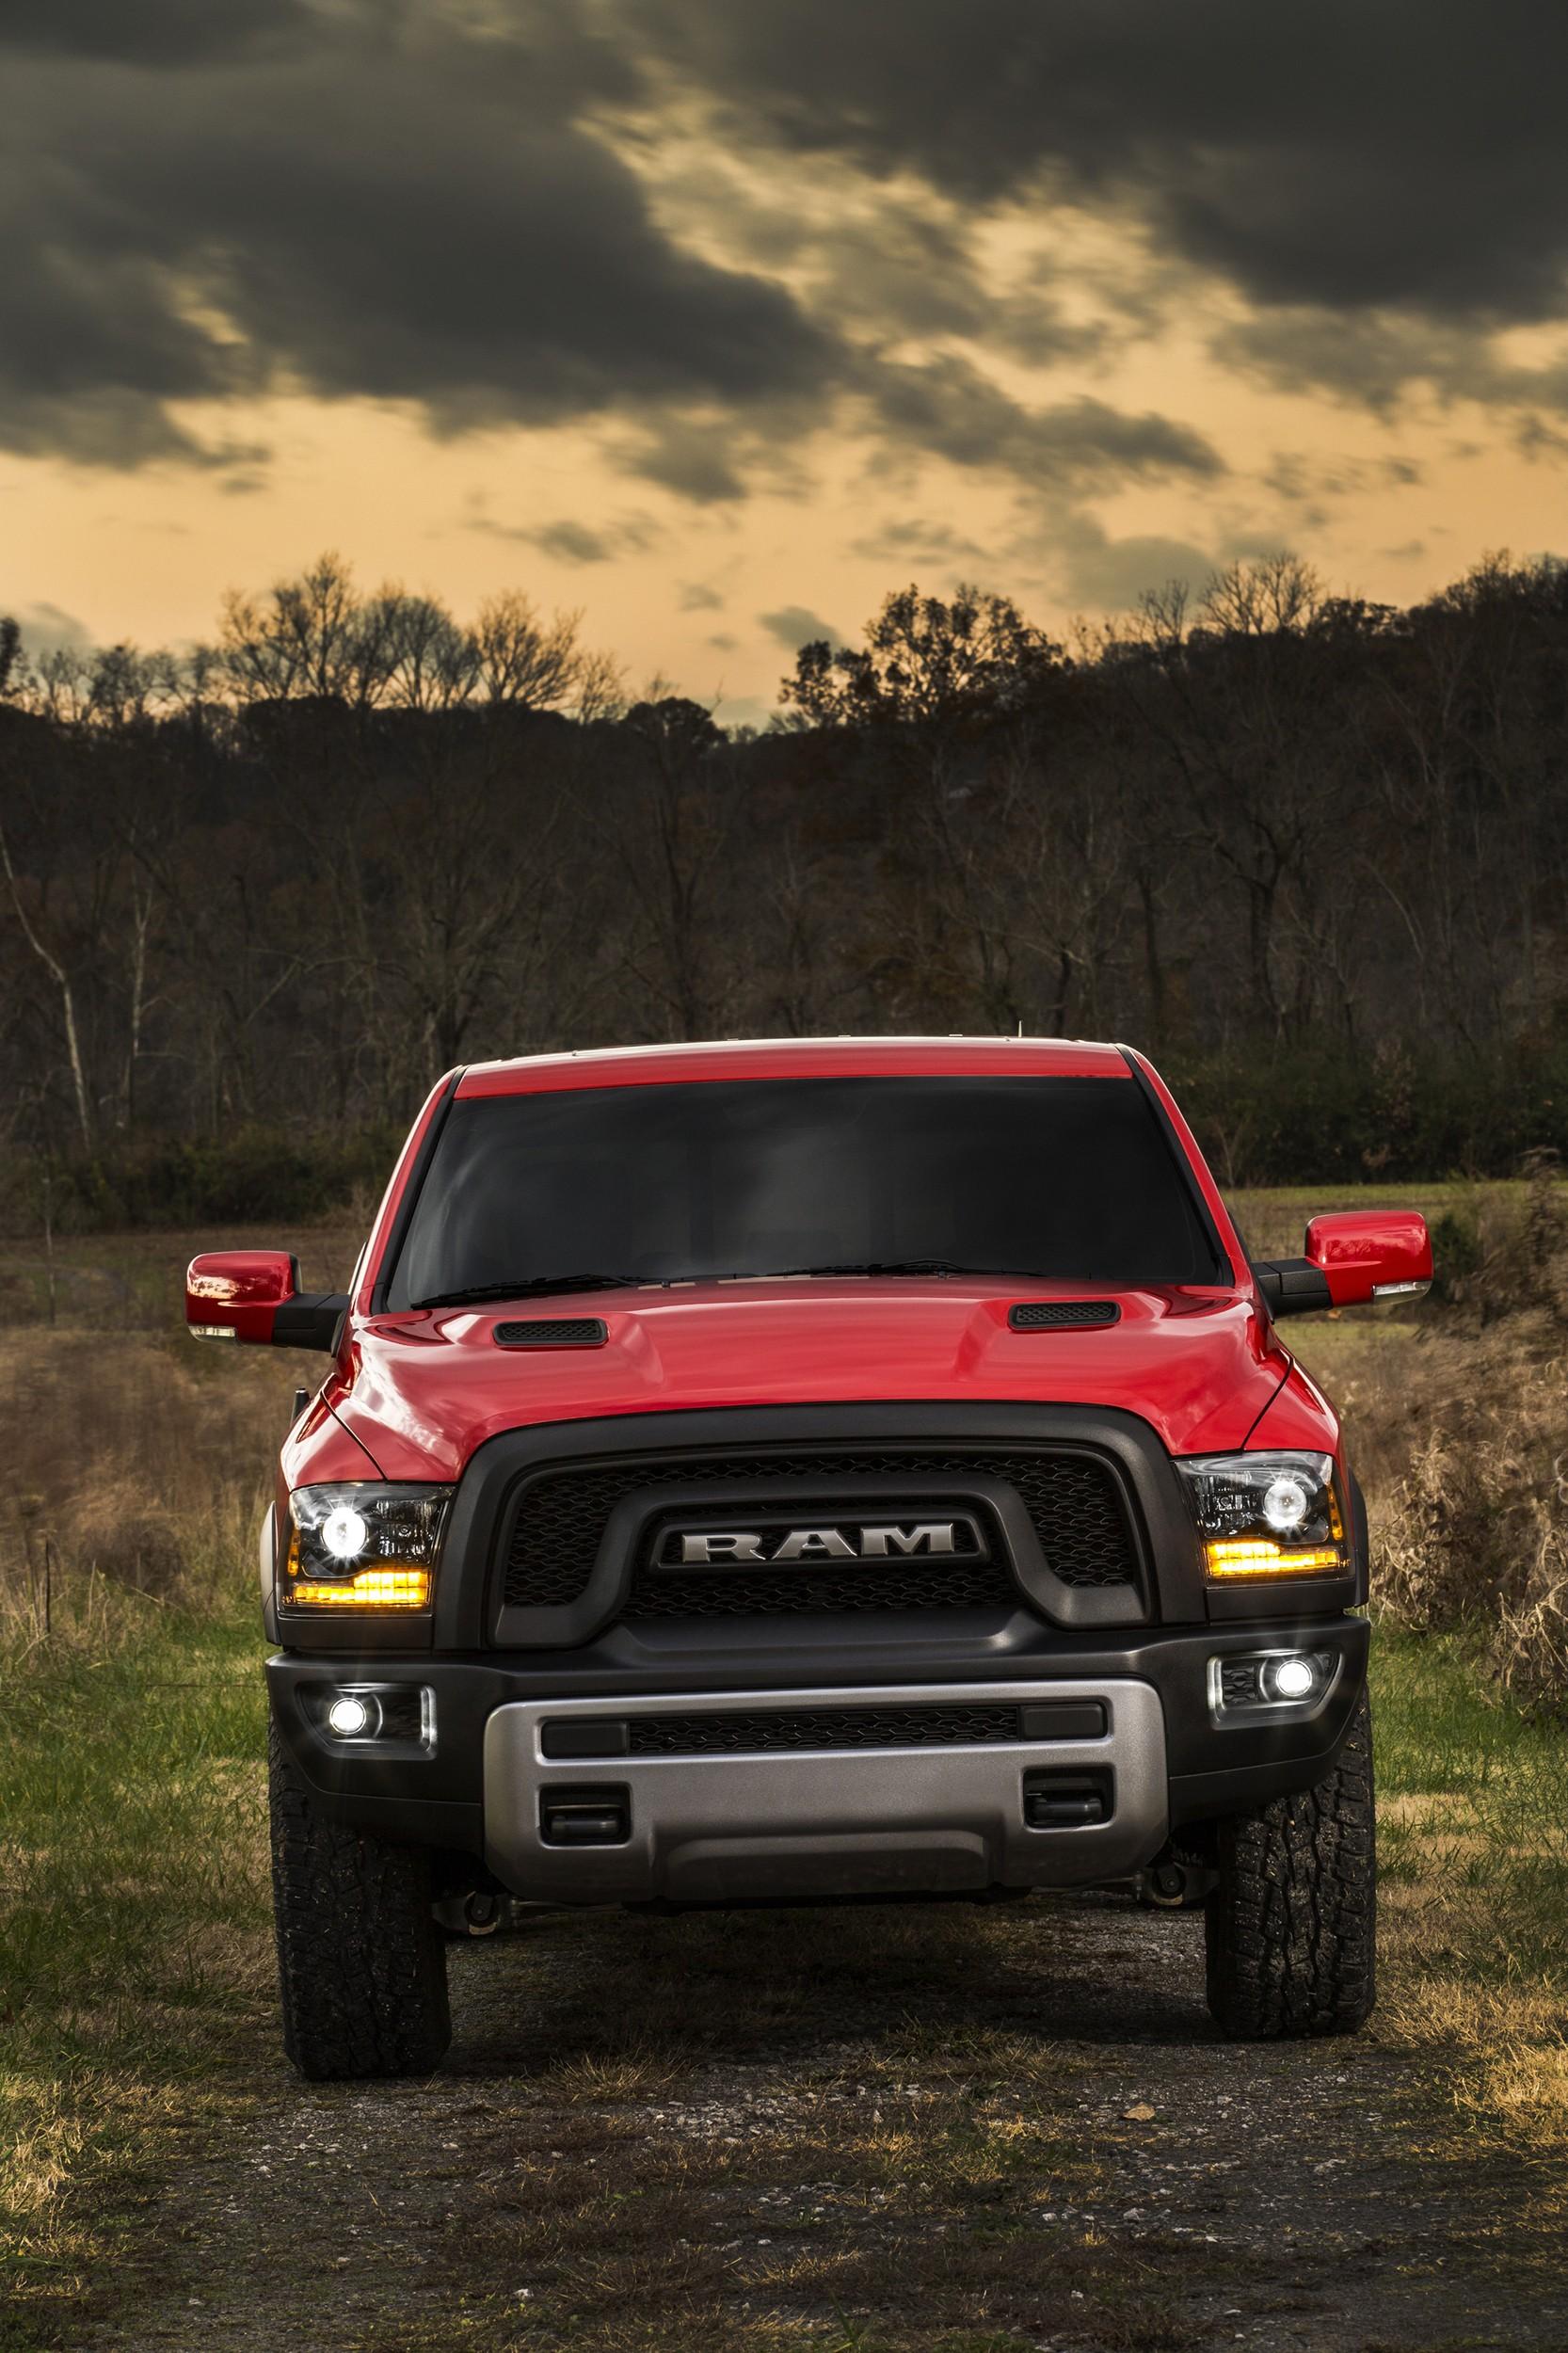 Ford Trucks 2016 >> 2016 Ram Heavy-Duty Pickup Truck Detailed - autoevolution